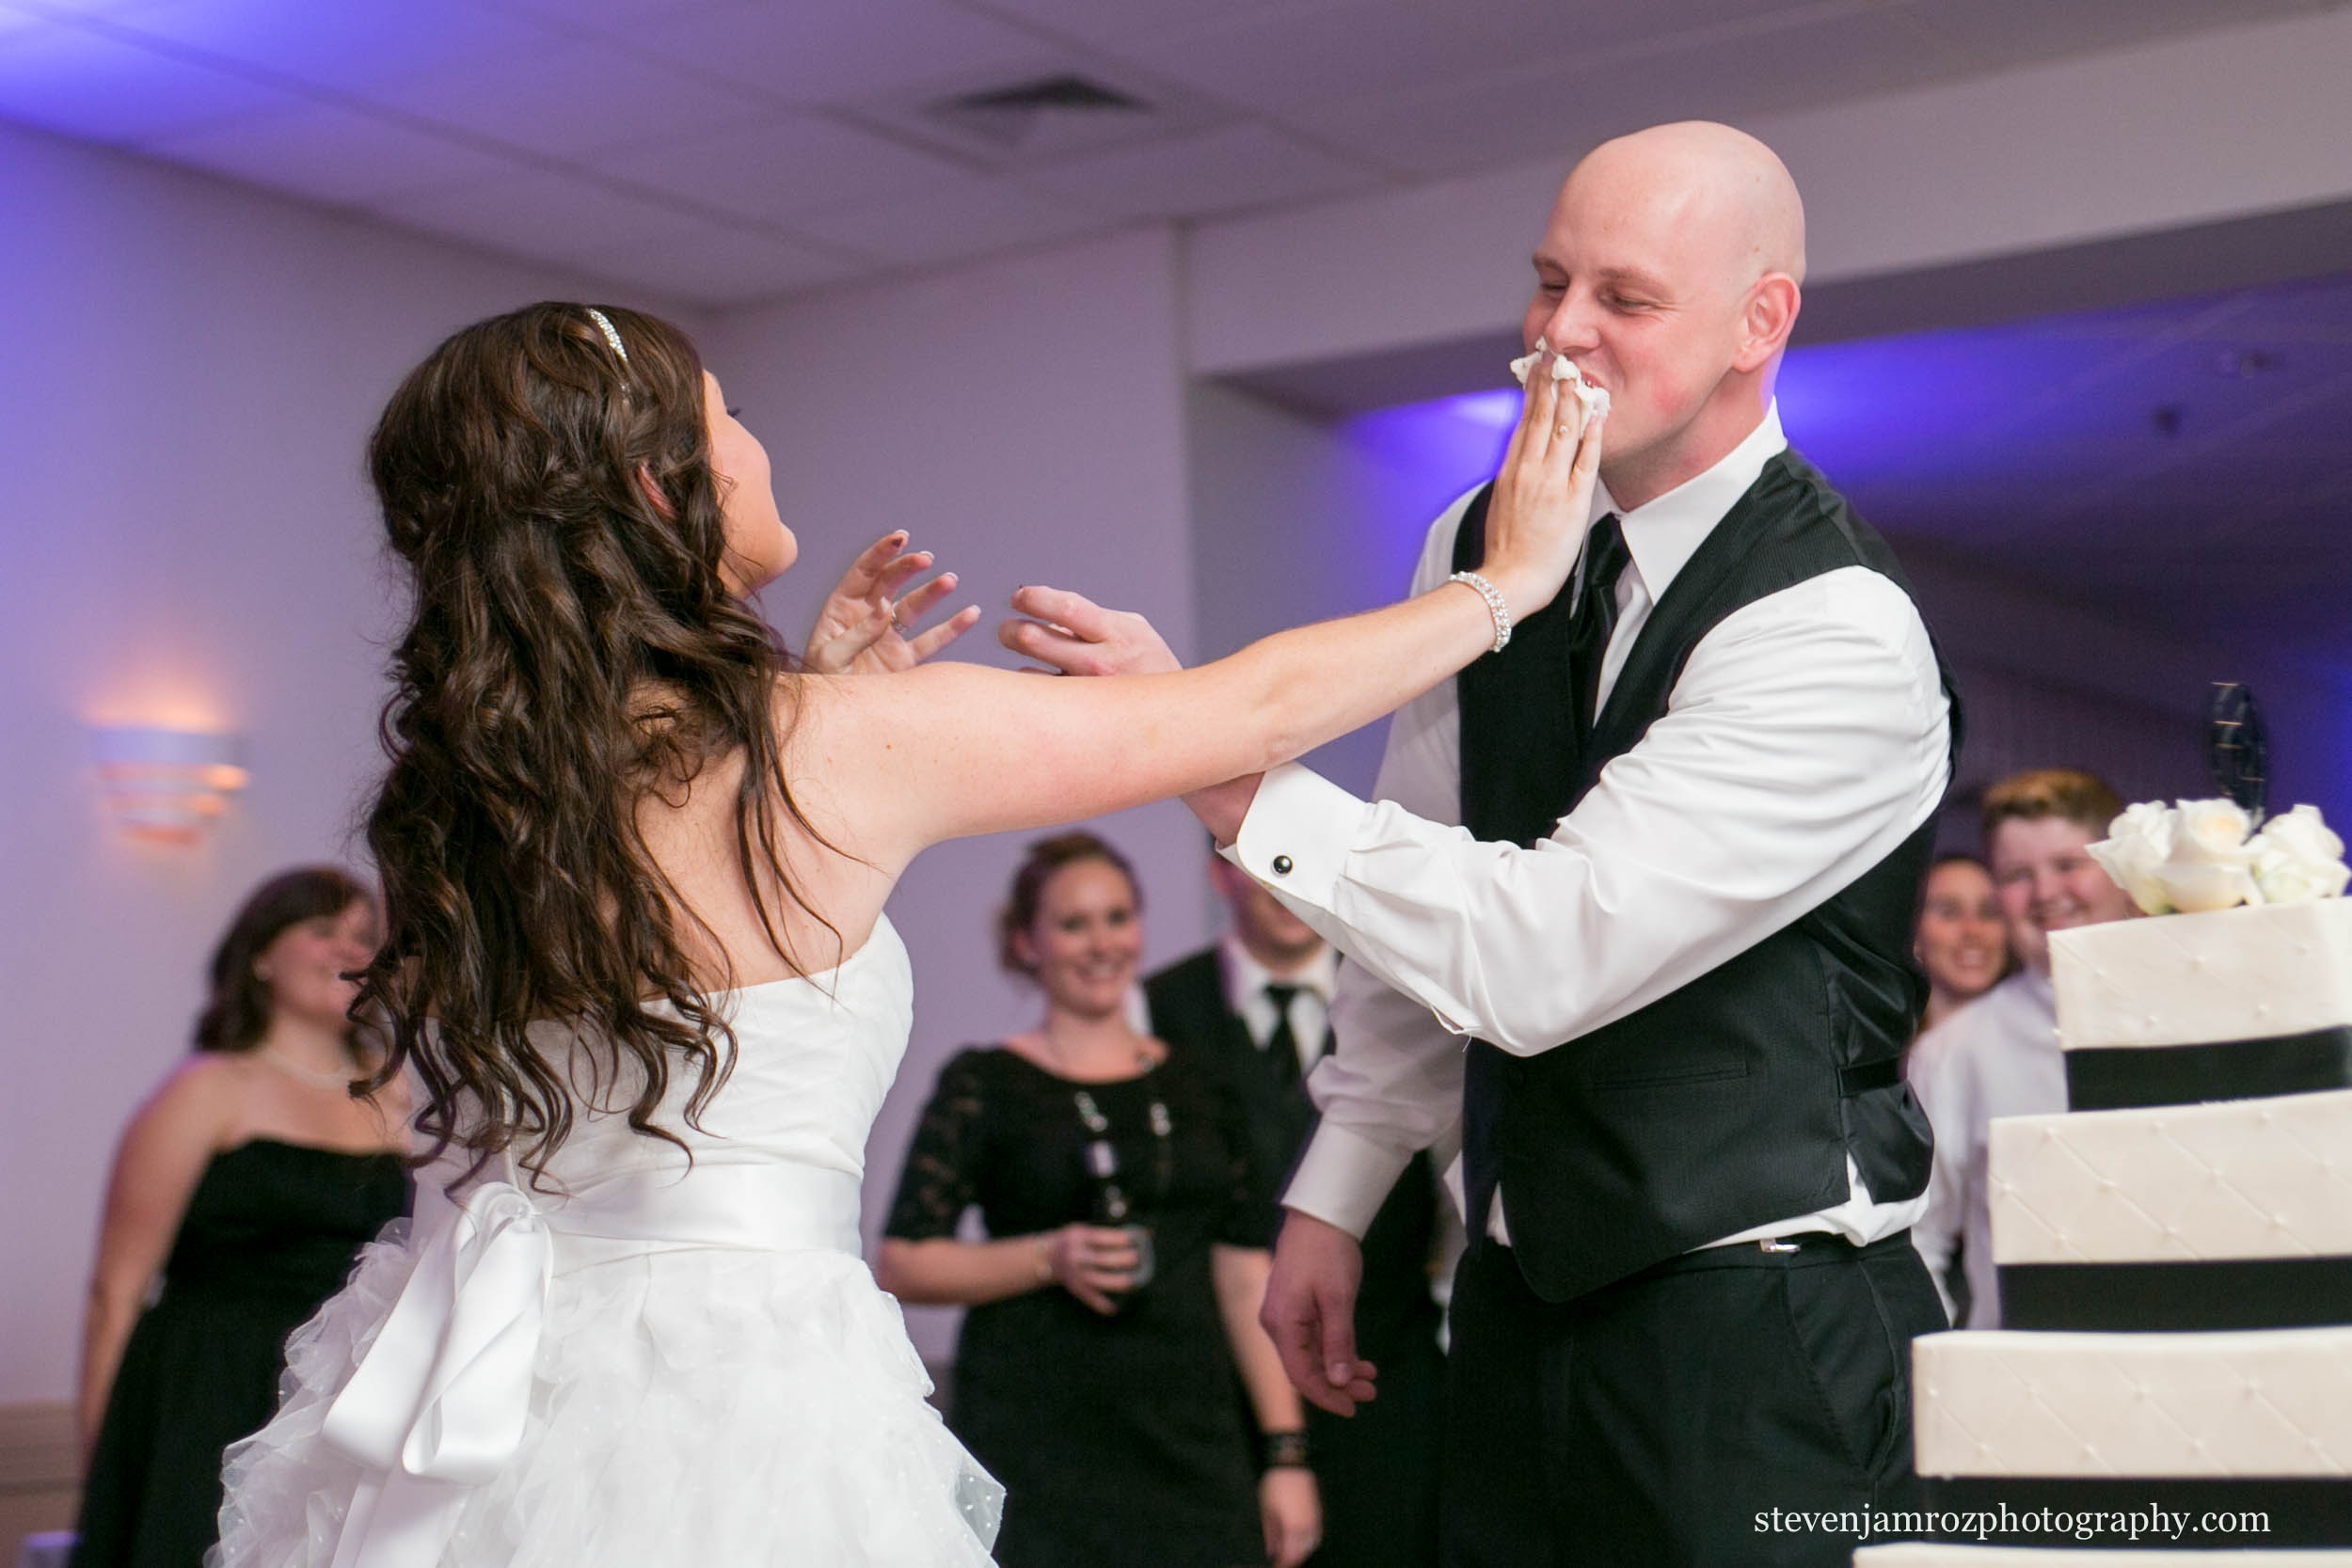 cake-cutting-nc-wedding-shrine-club-steven-jamroz-photography-0569.jpg